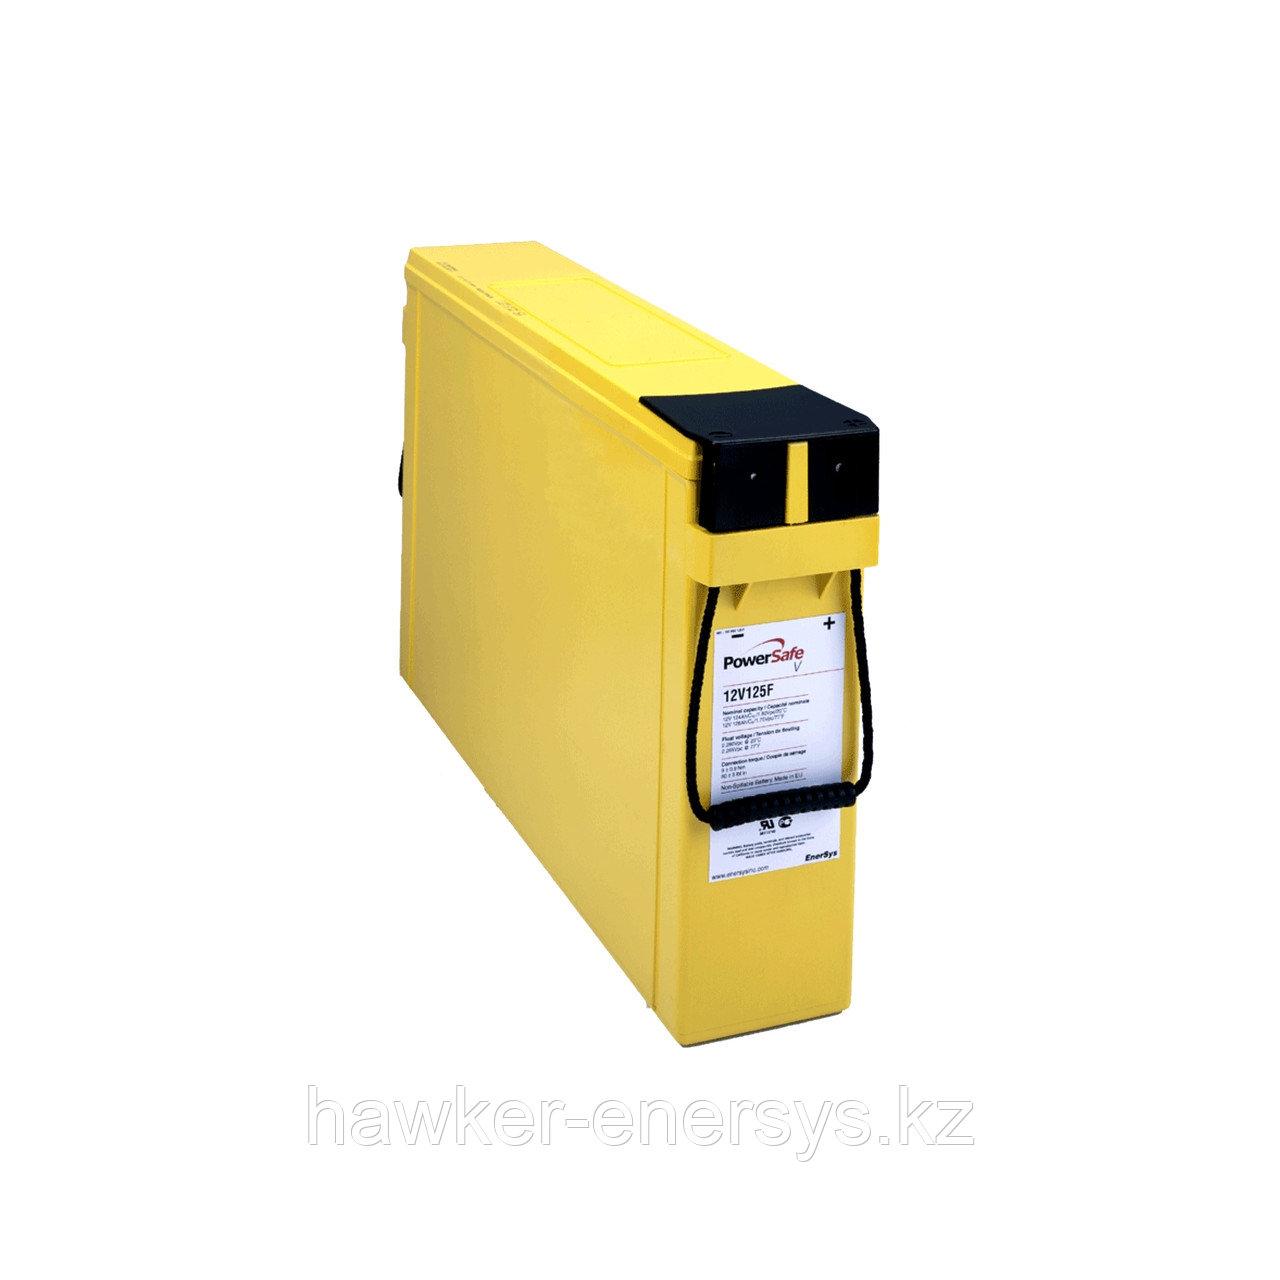 Аккумуляторная батарея PowerSafe 12V125F